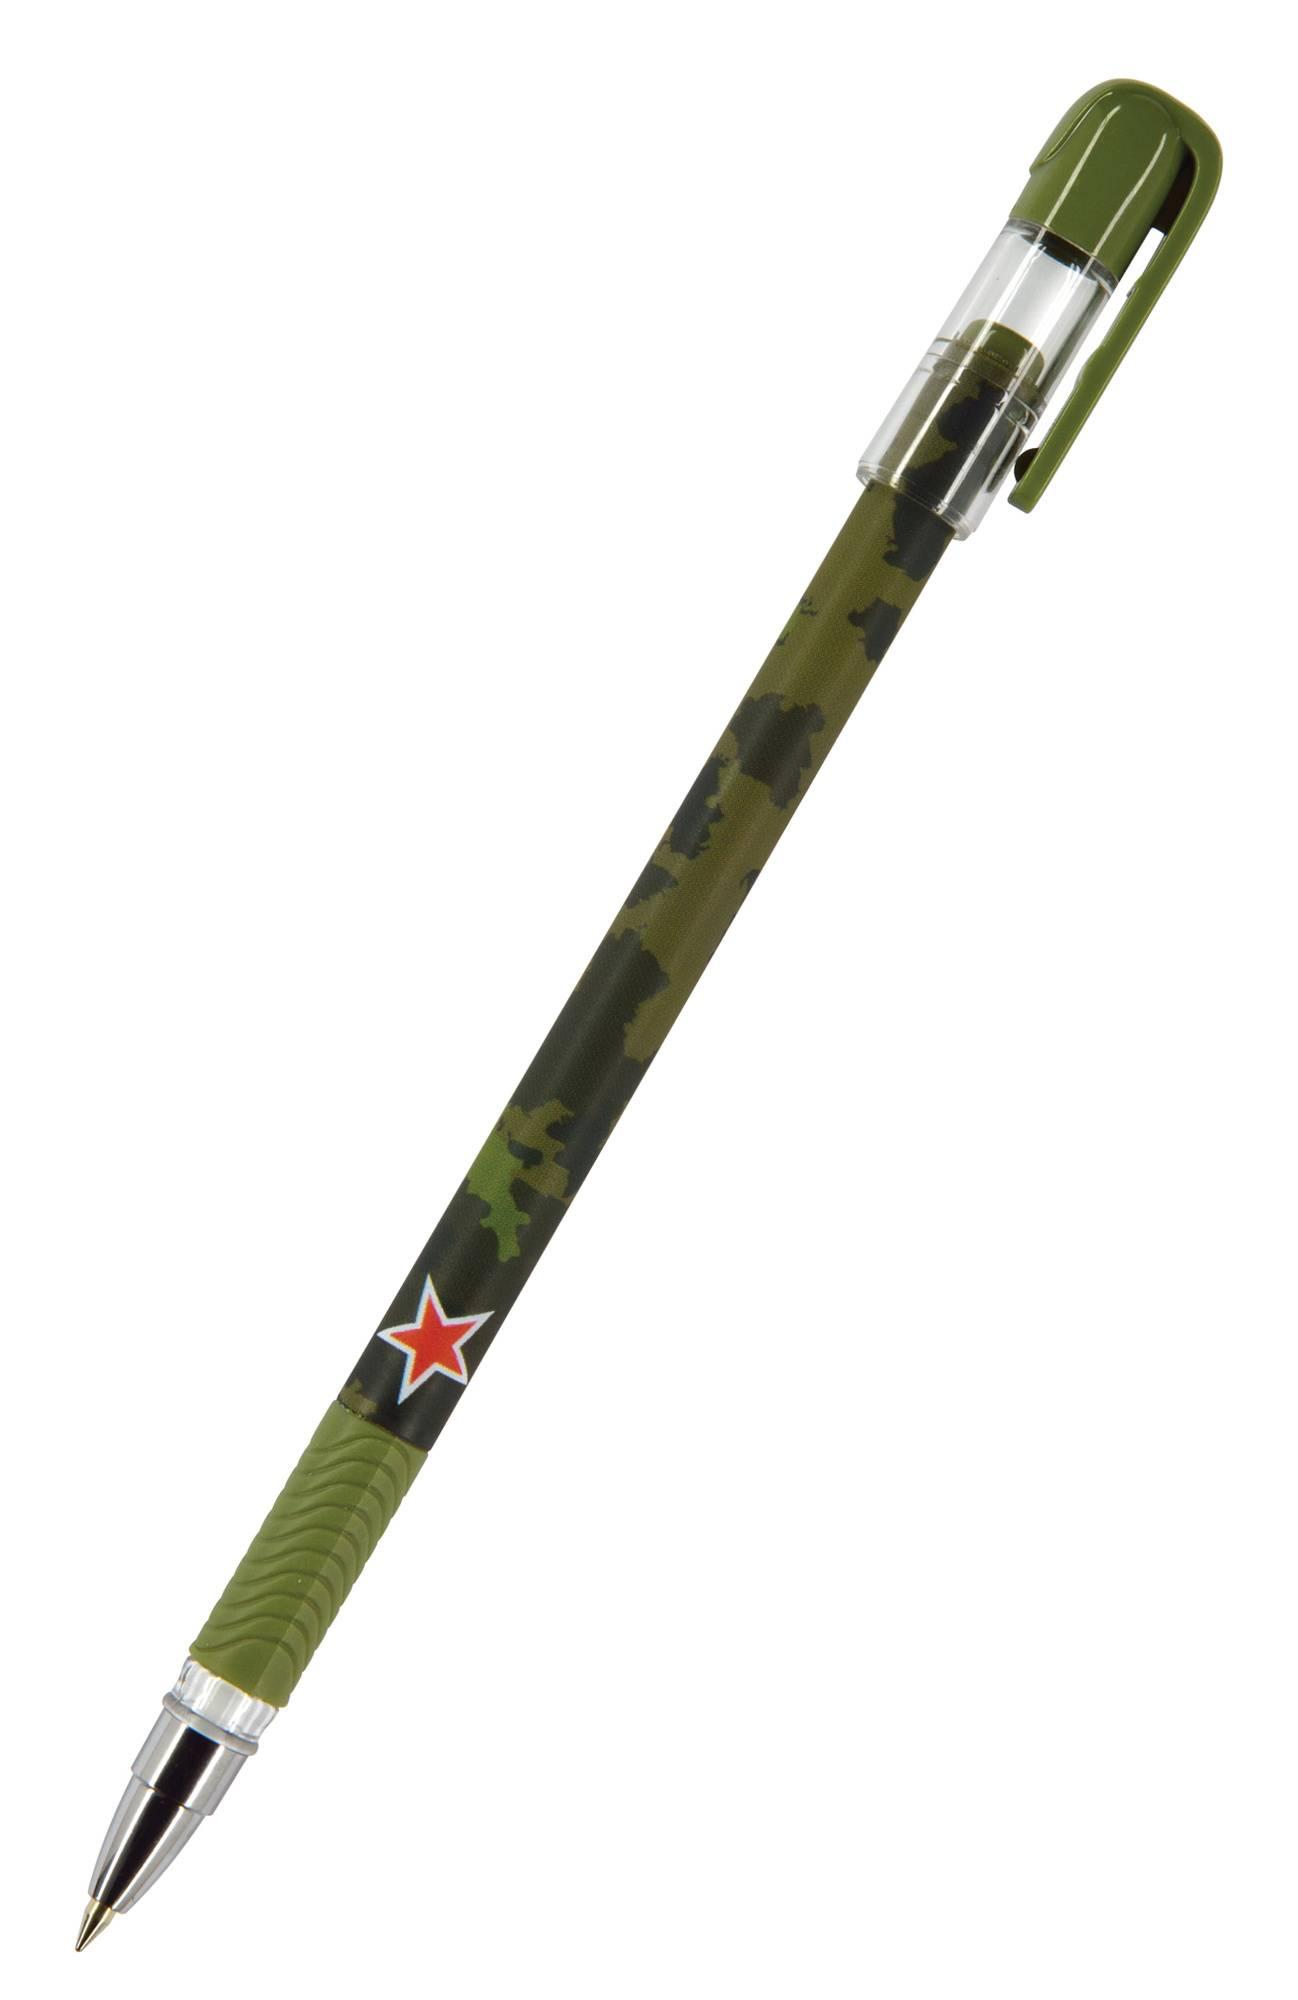 Ручка шариковая Br.V. MagicWrite (20-0240/23) - фото 1